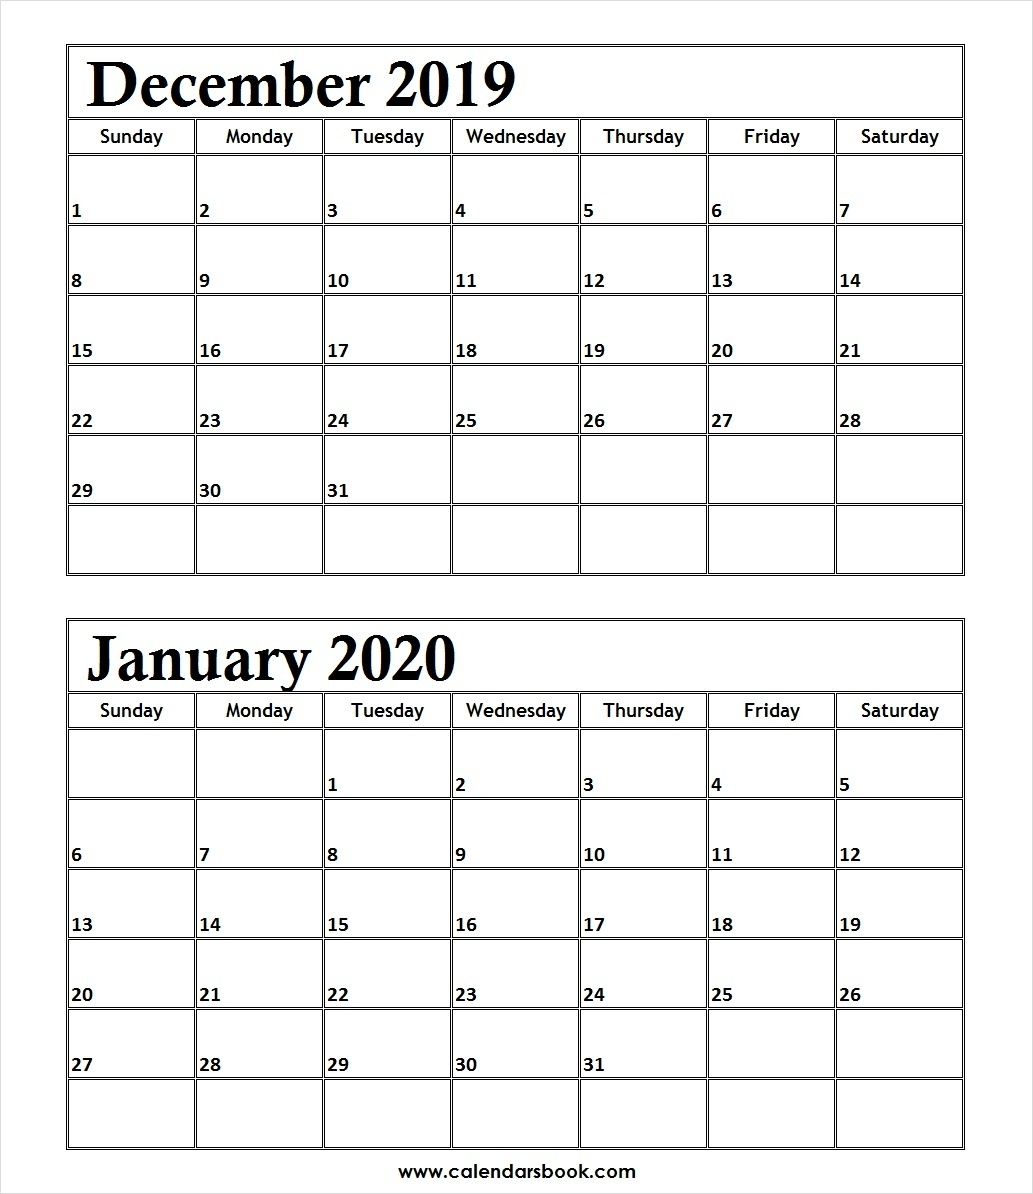 Print December 2019 January 2020 Calendar Template | 2 Month